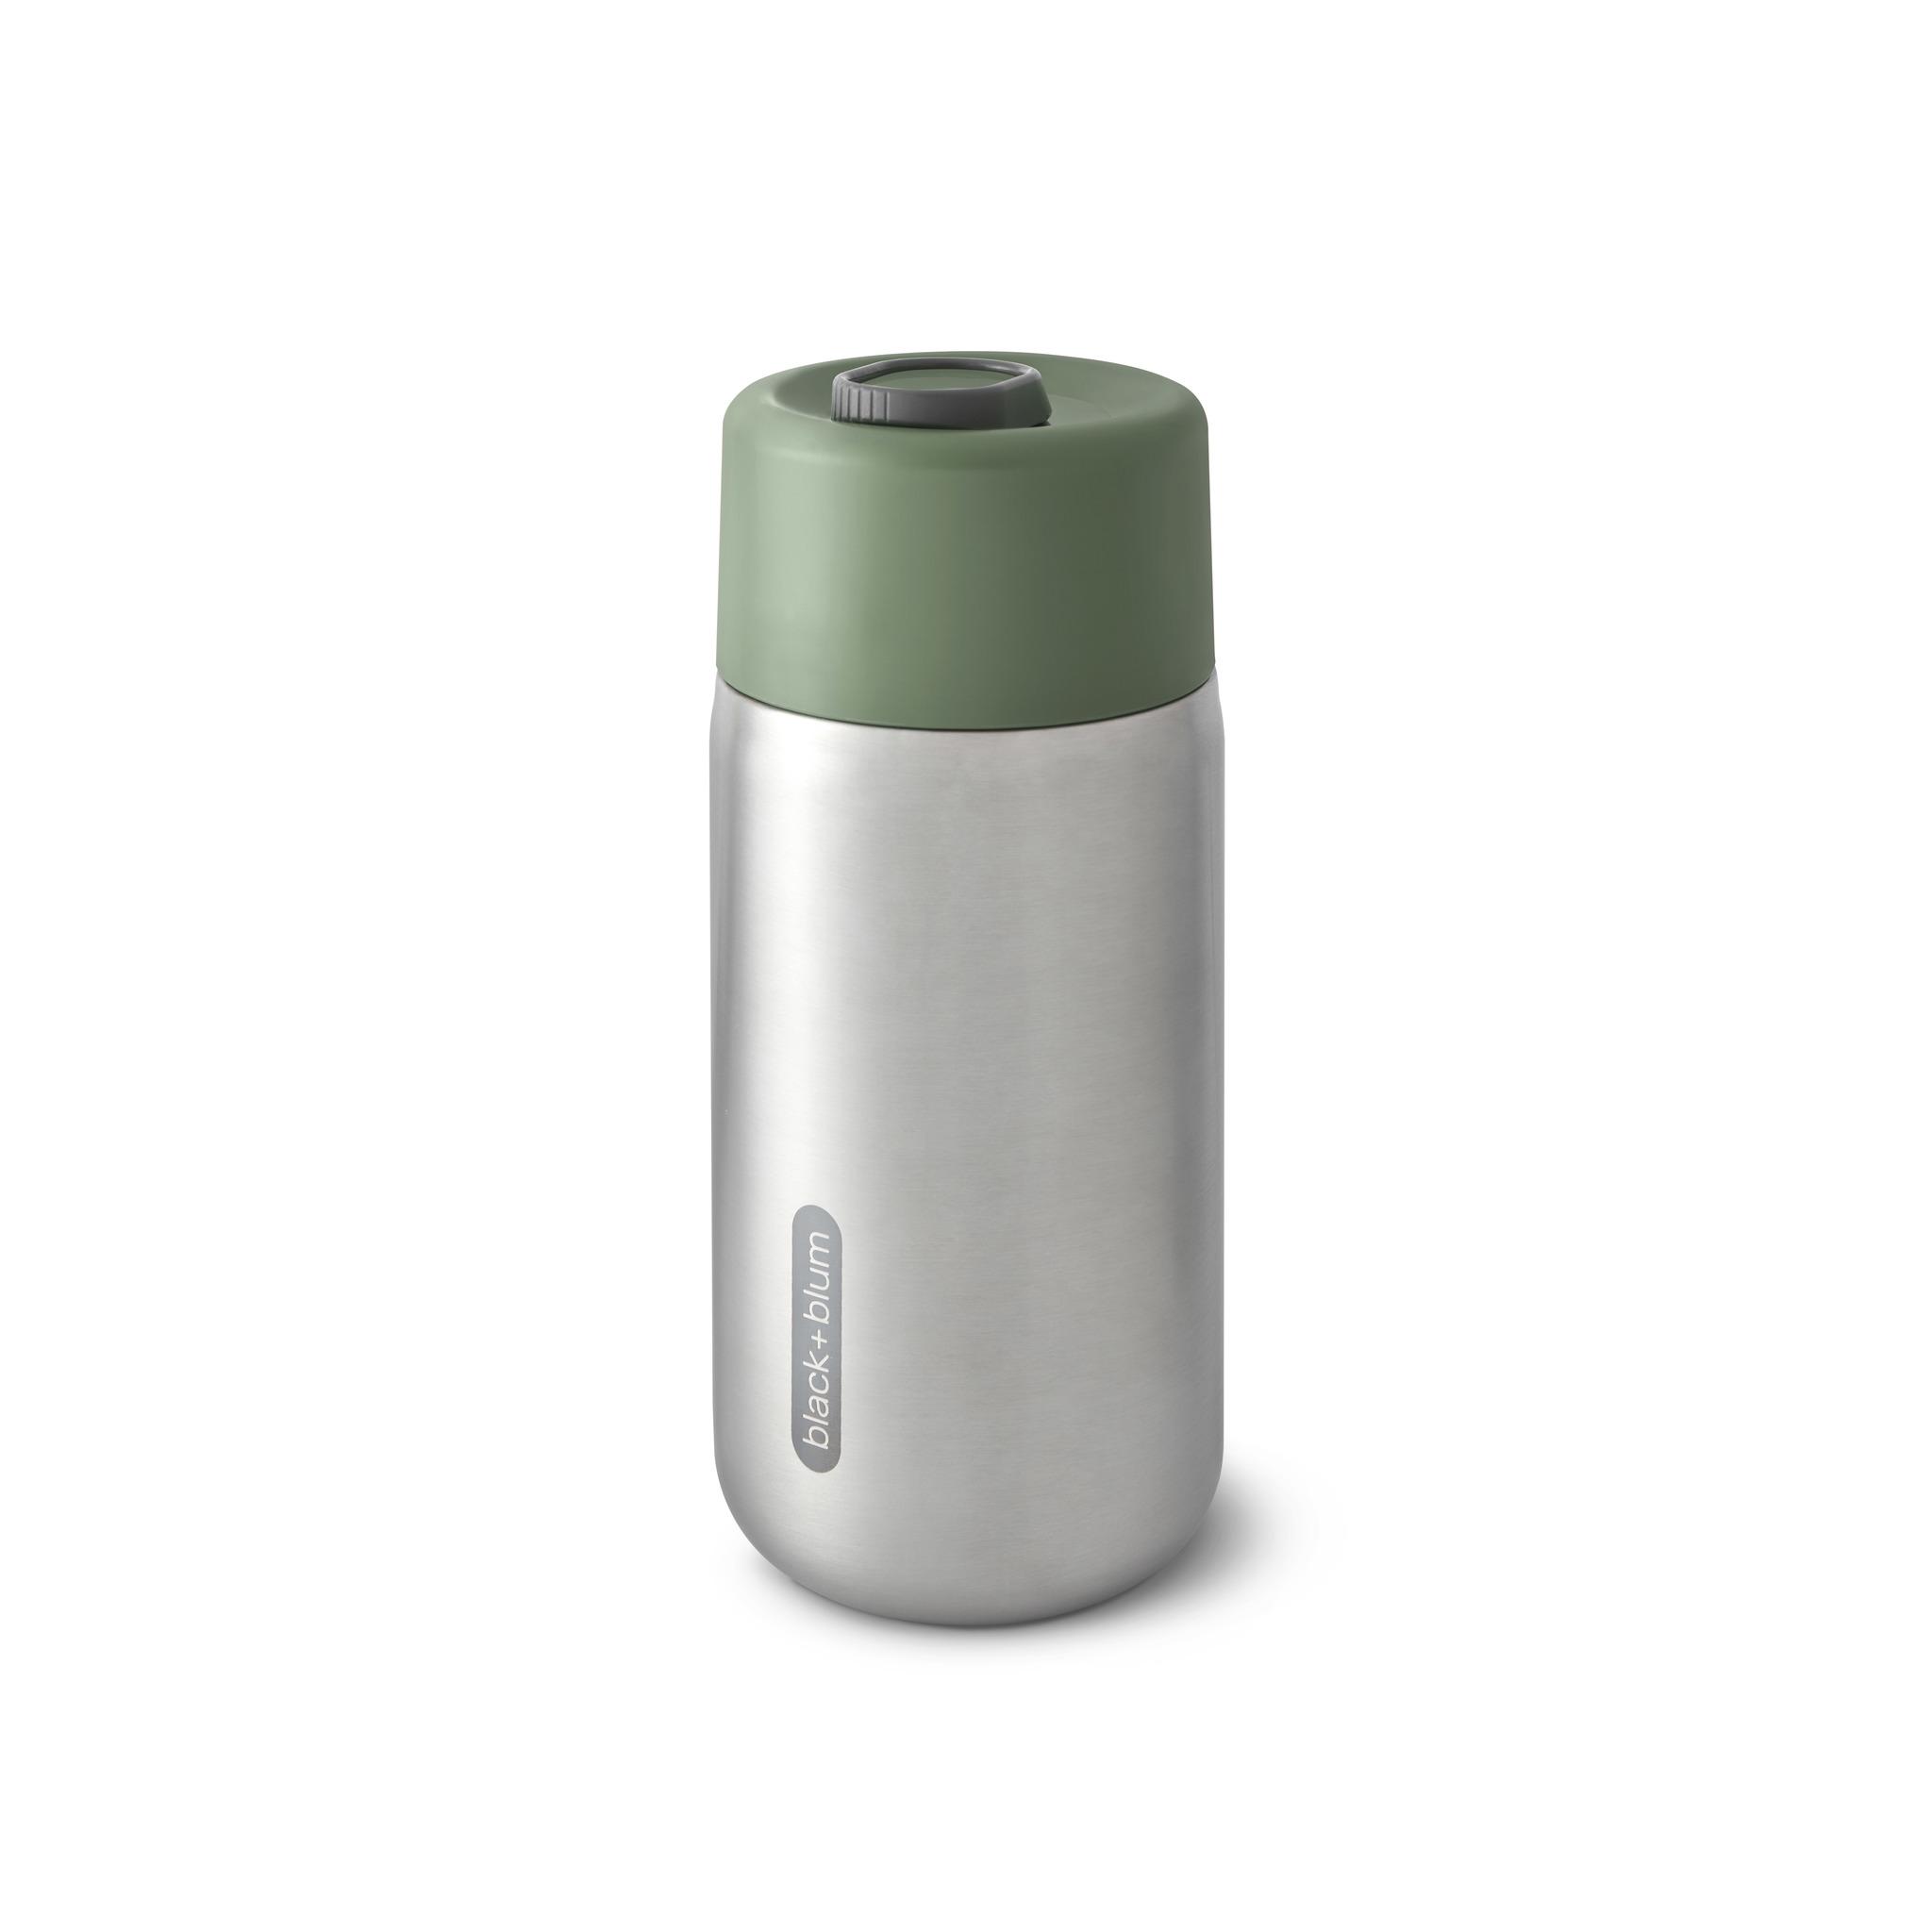 Olive, 340 ml, hält Getränke 5h heiss, 100% Auslau